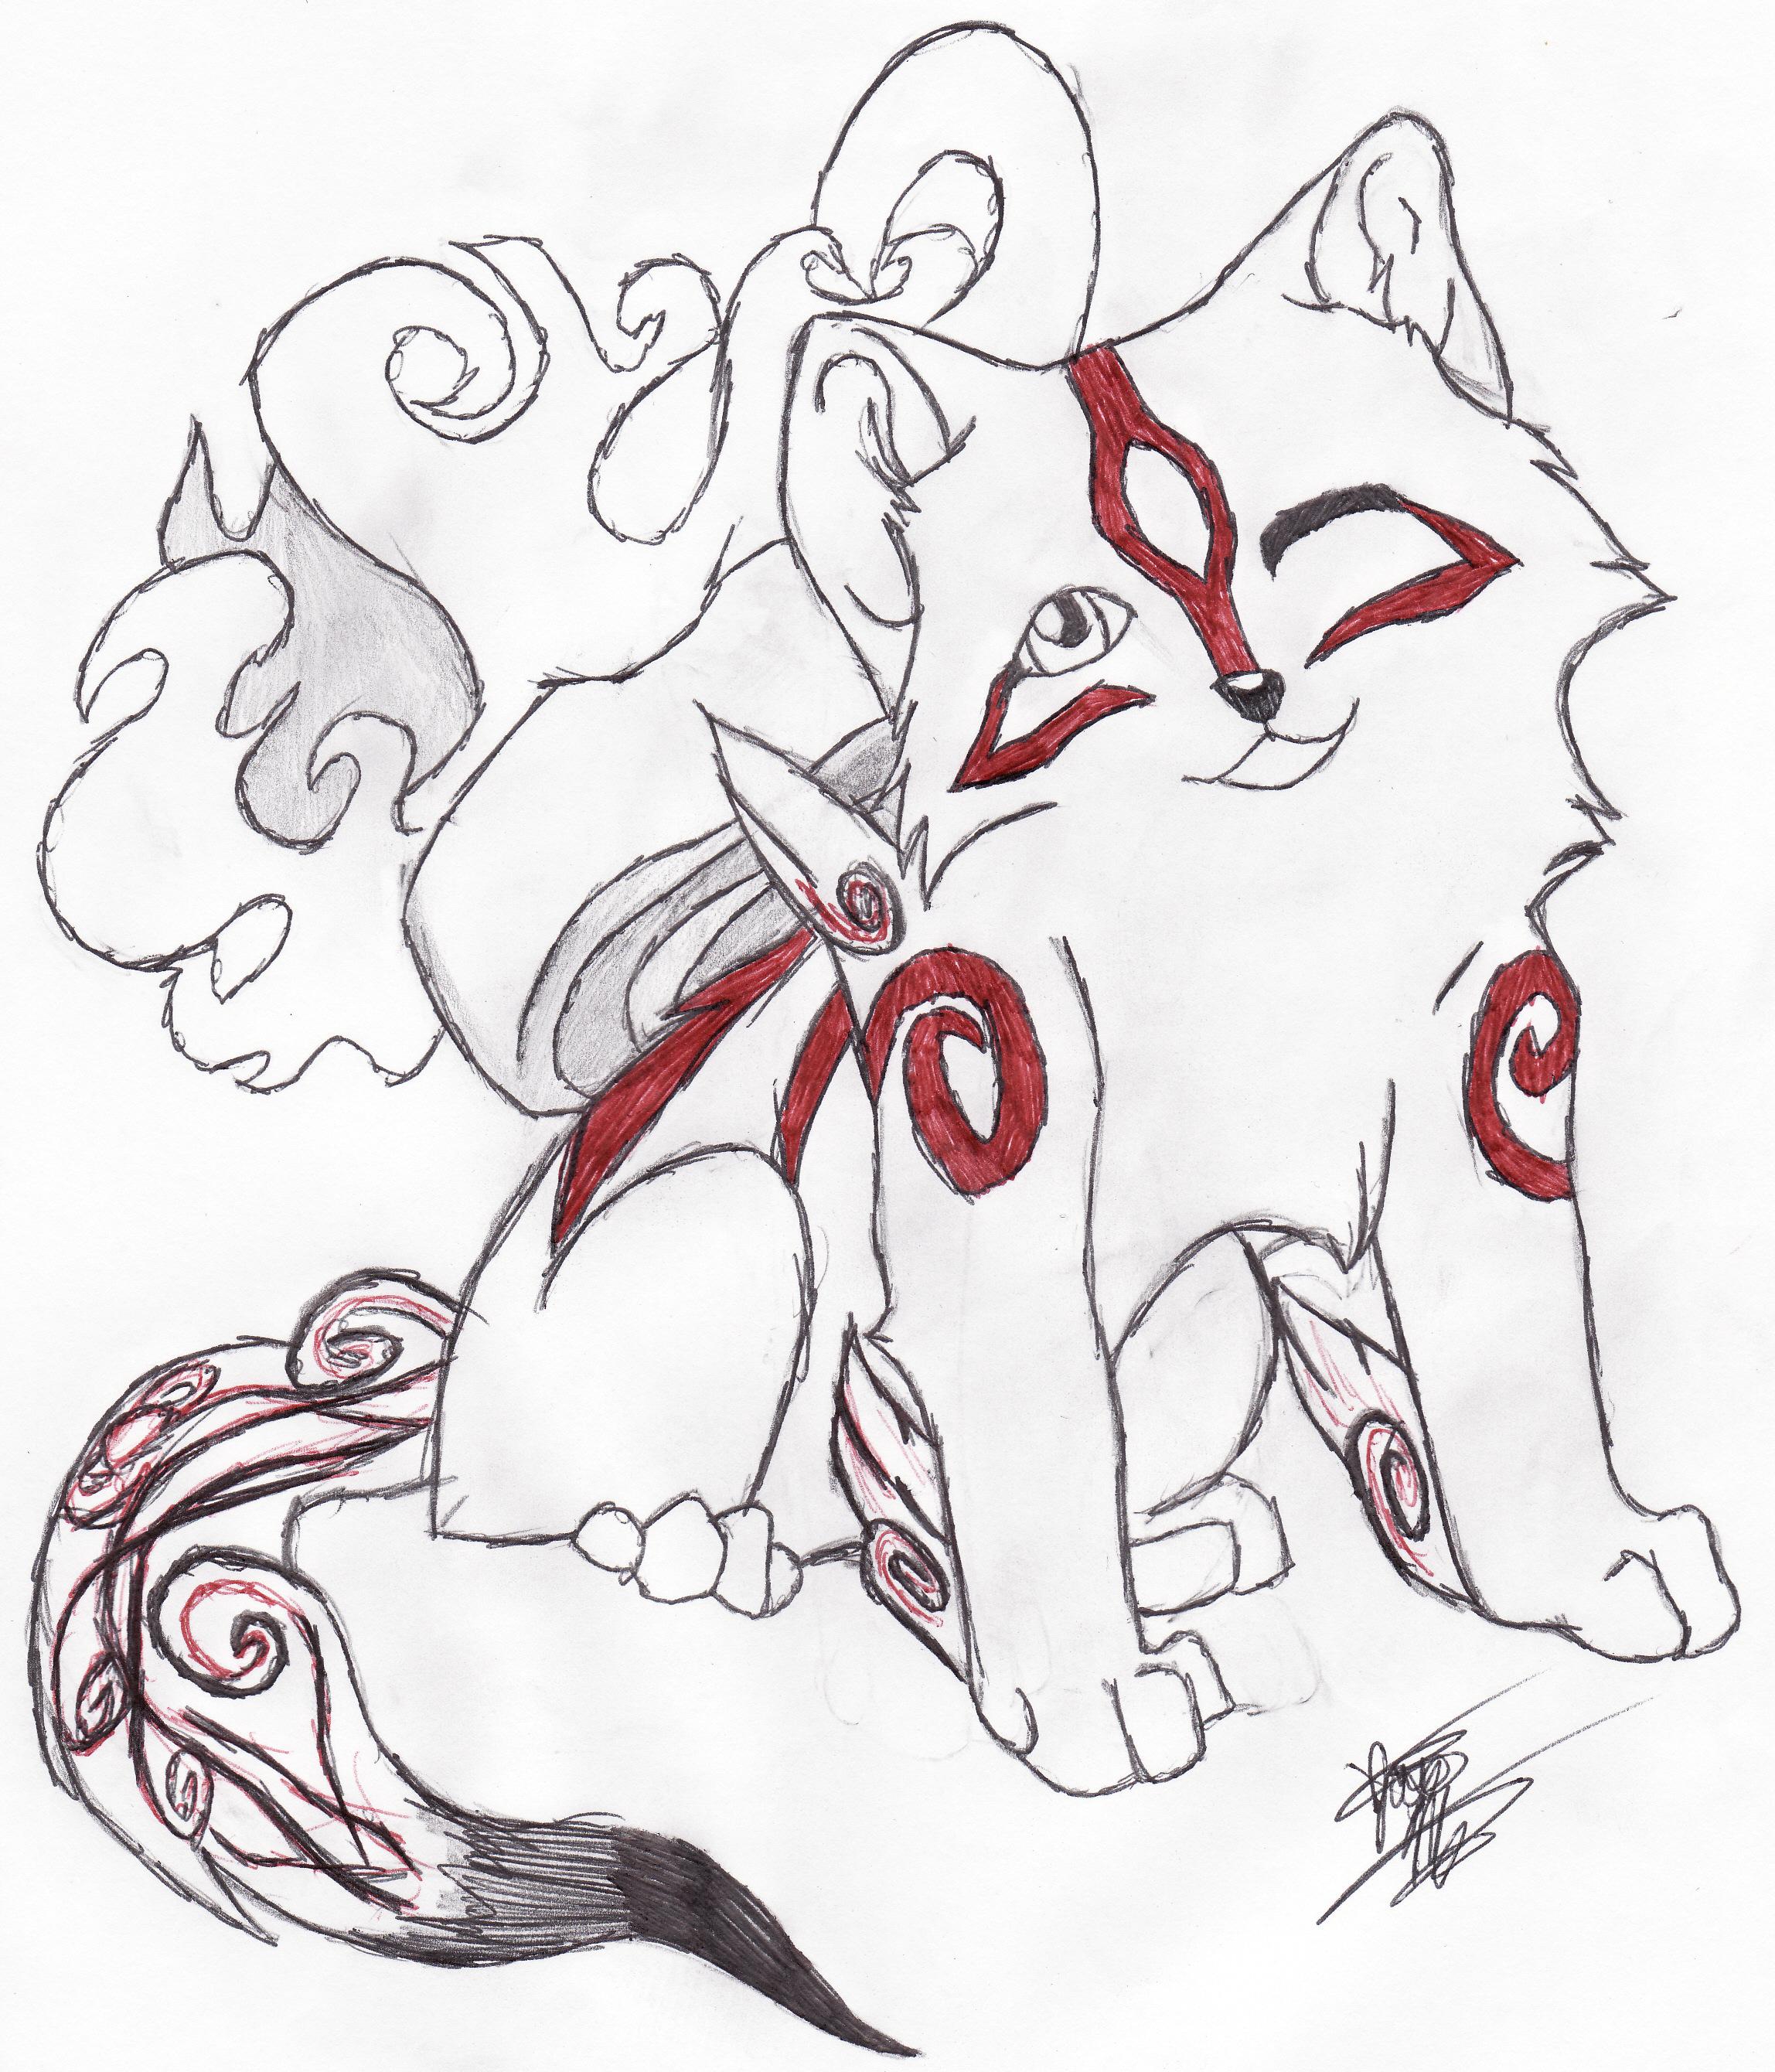 chibi amaterasu by okami-lover1234 on deviantART